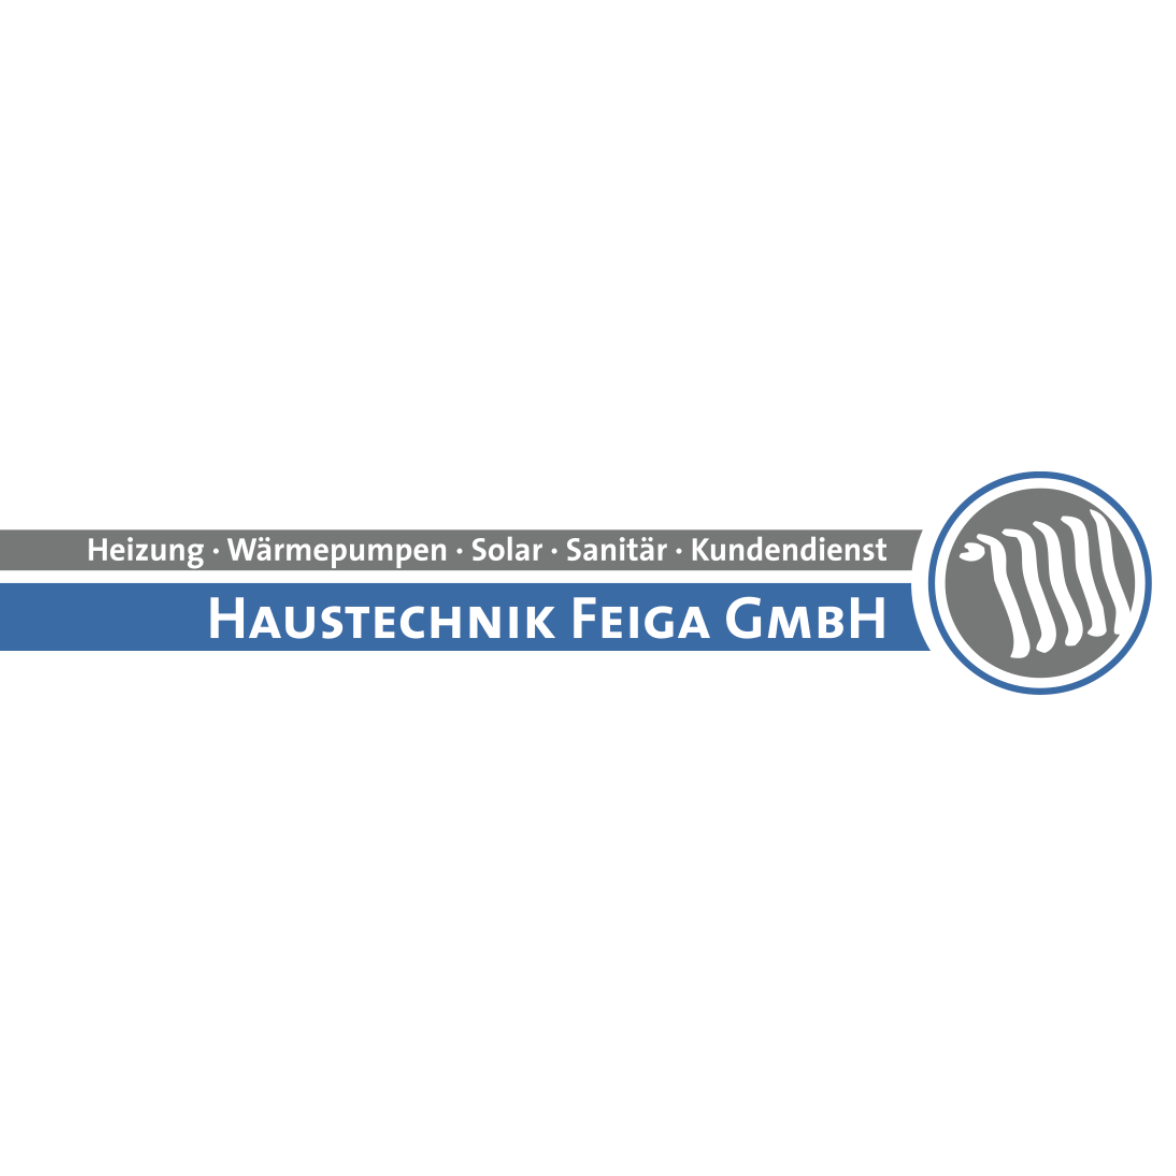 Haustechnik Feiga GmbH